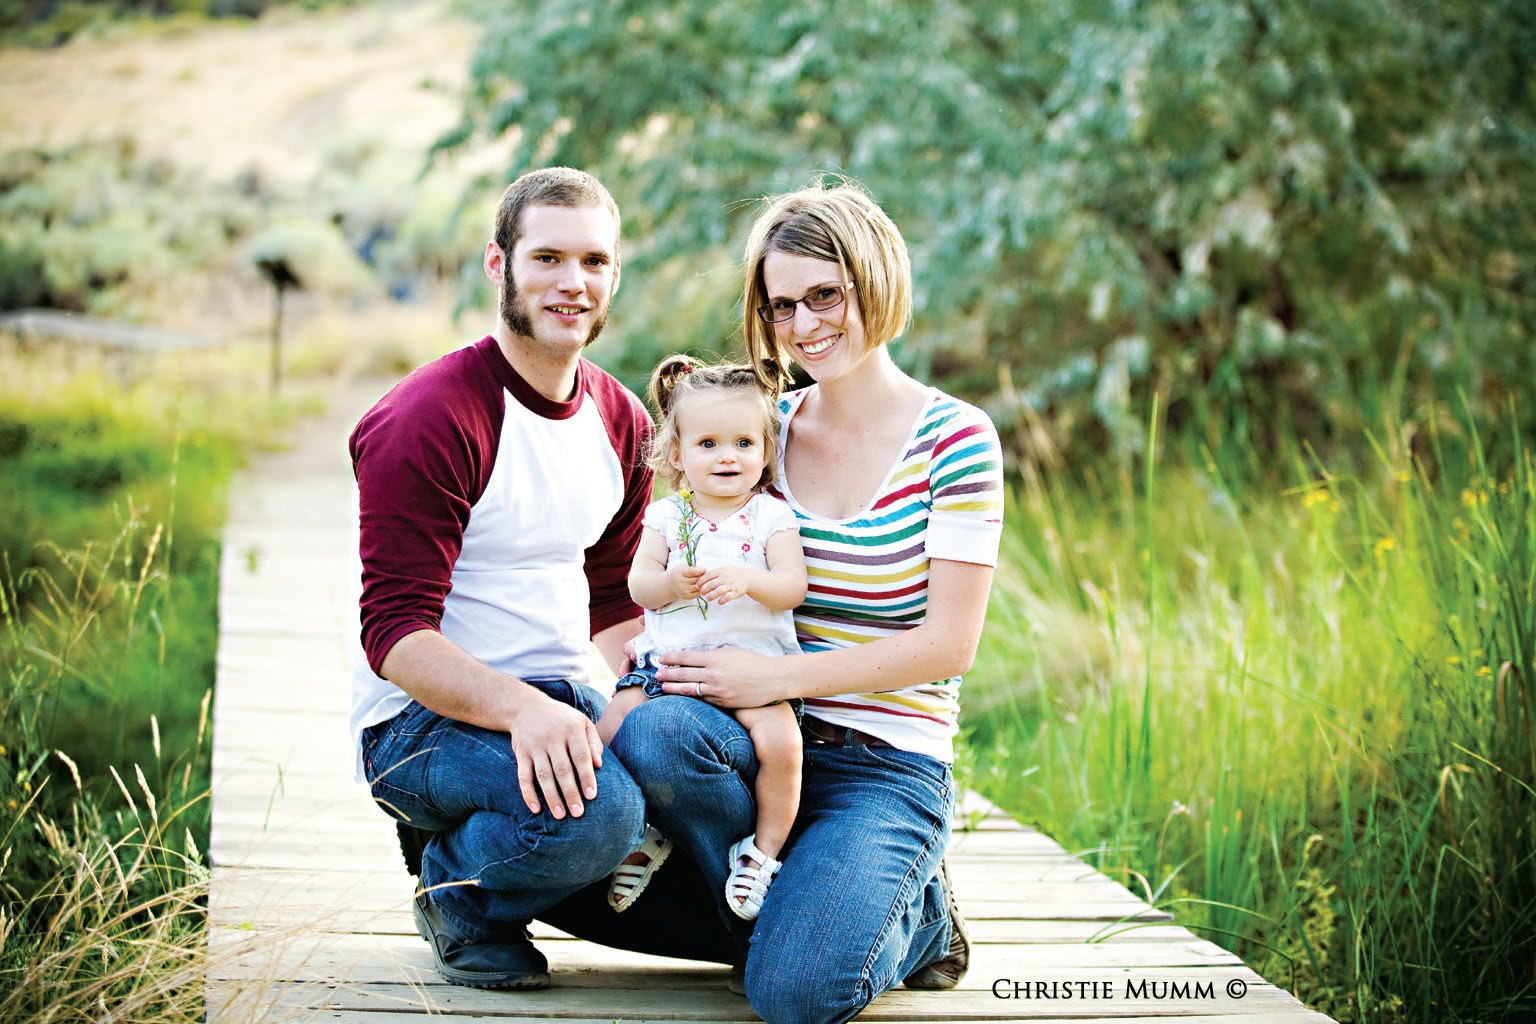 The Portrait Photographer Posing For Families